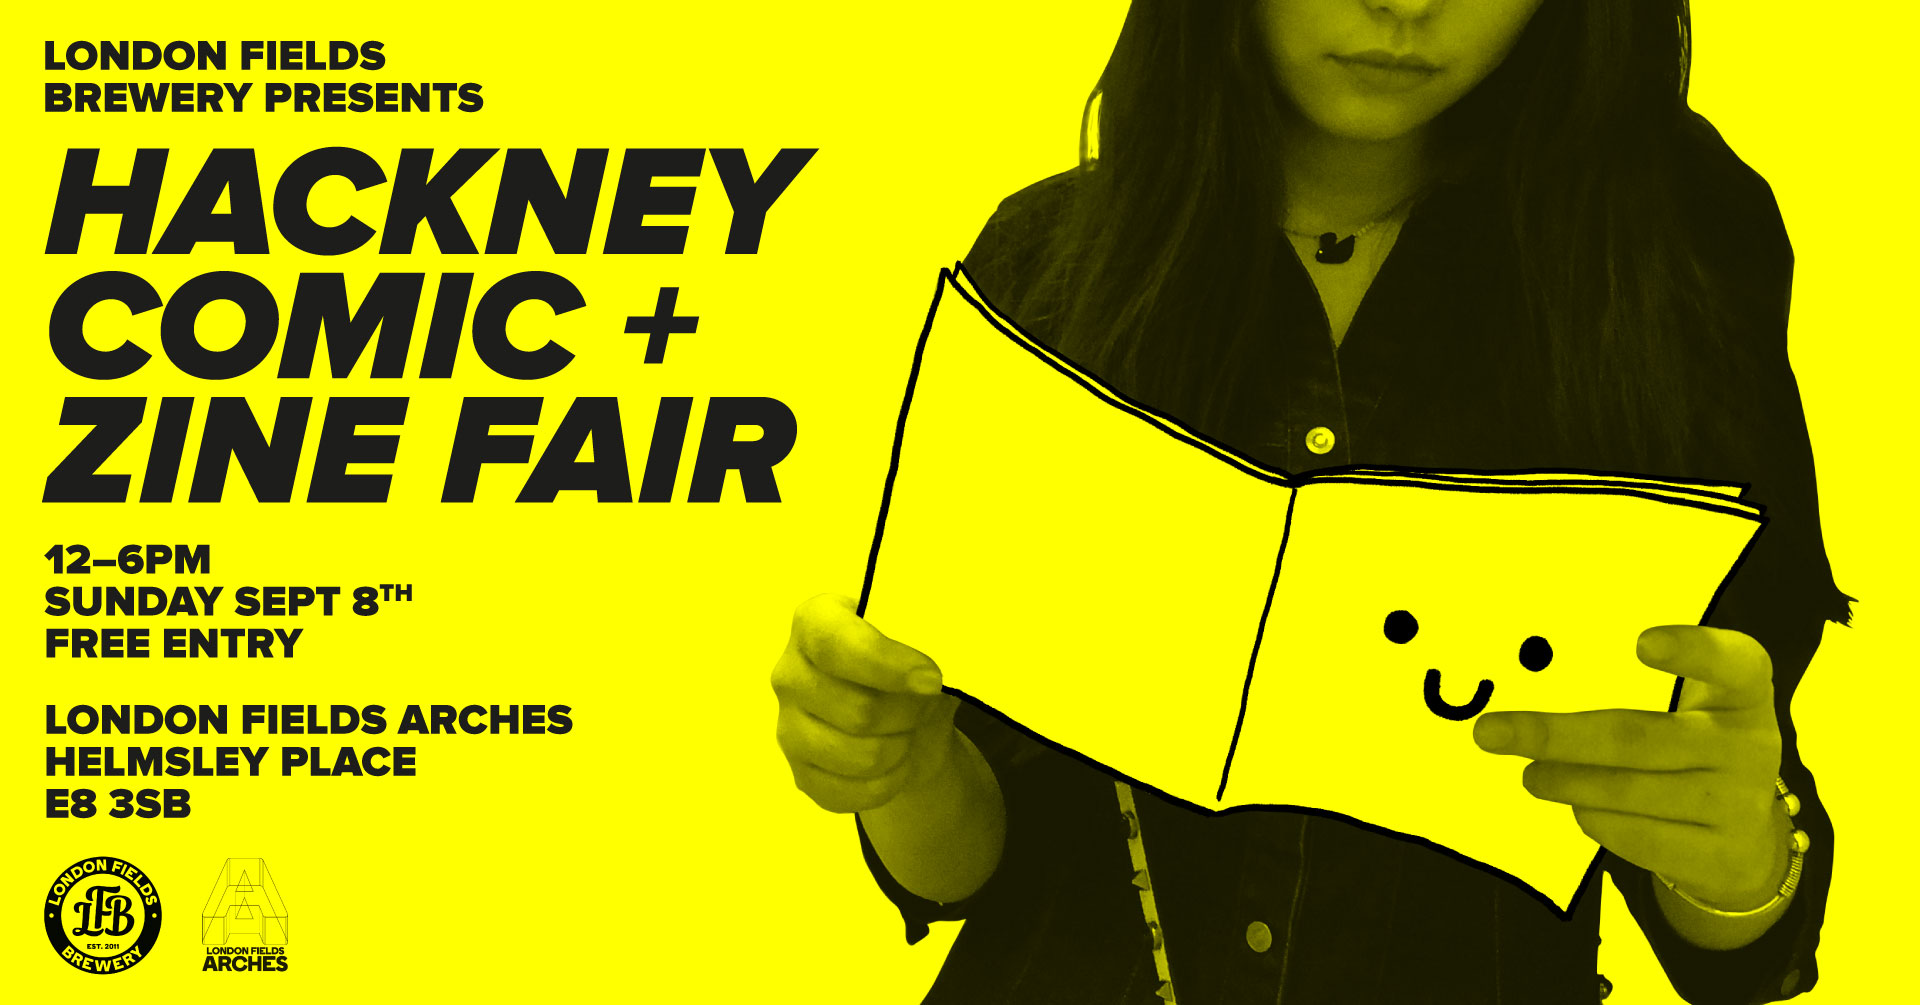 Hackney Comic + Zine Fair 2019